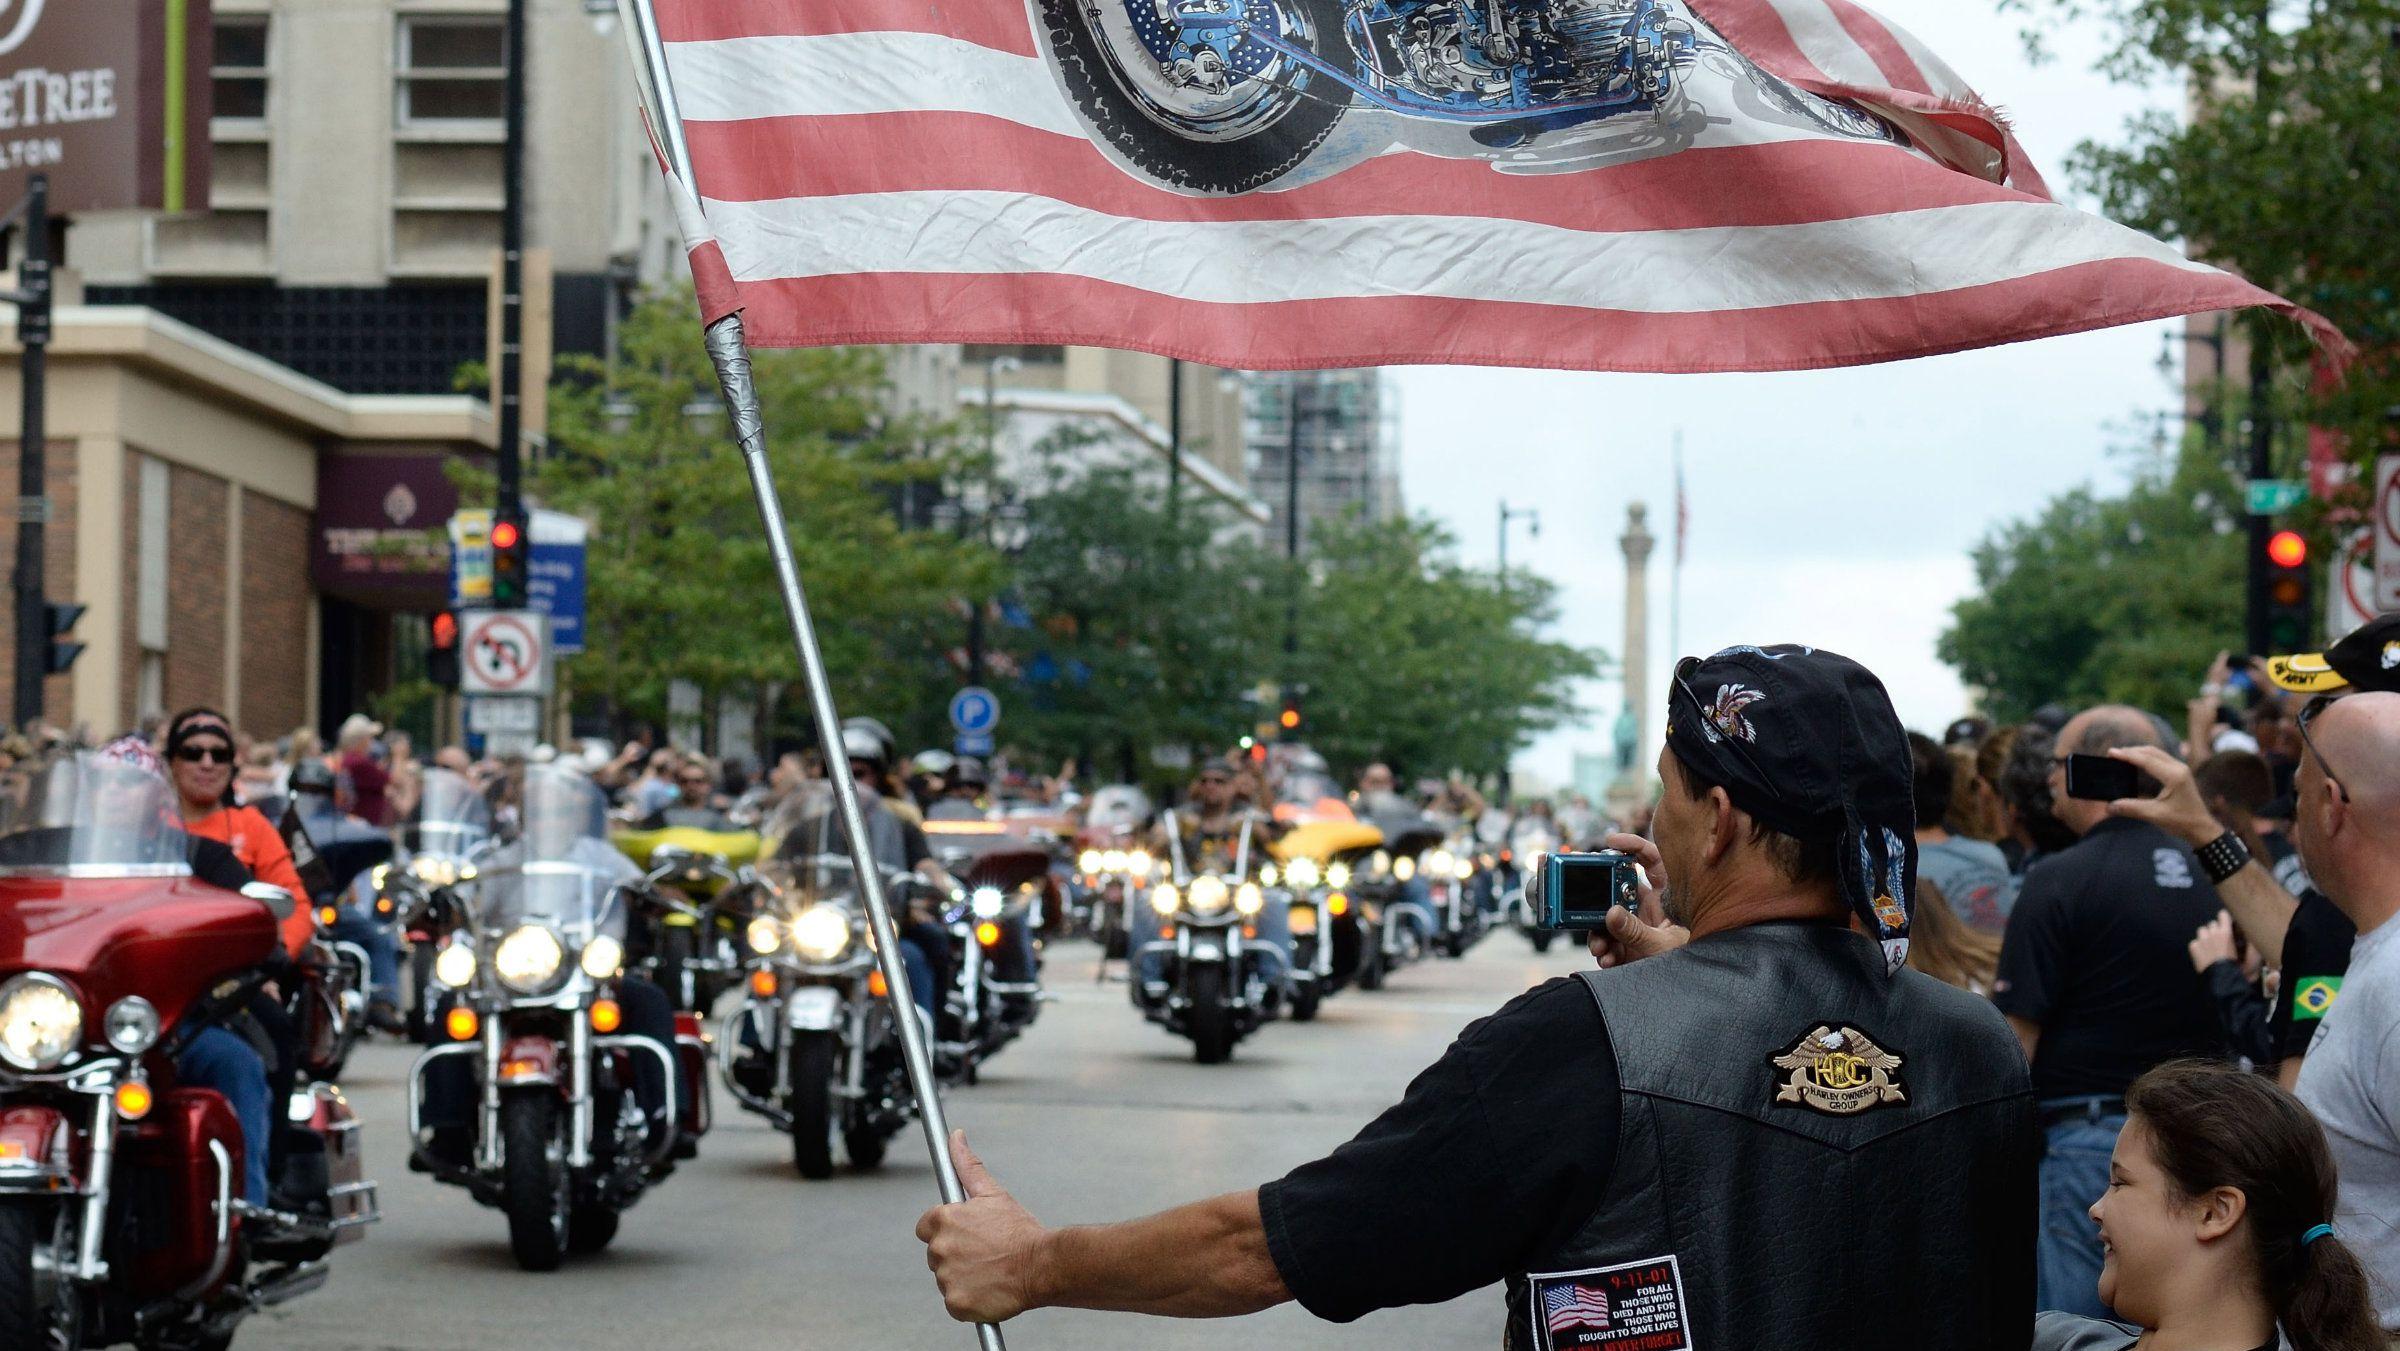 Harley DAvidson Motor Company white boomers